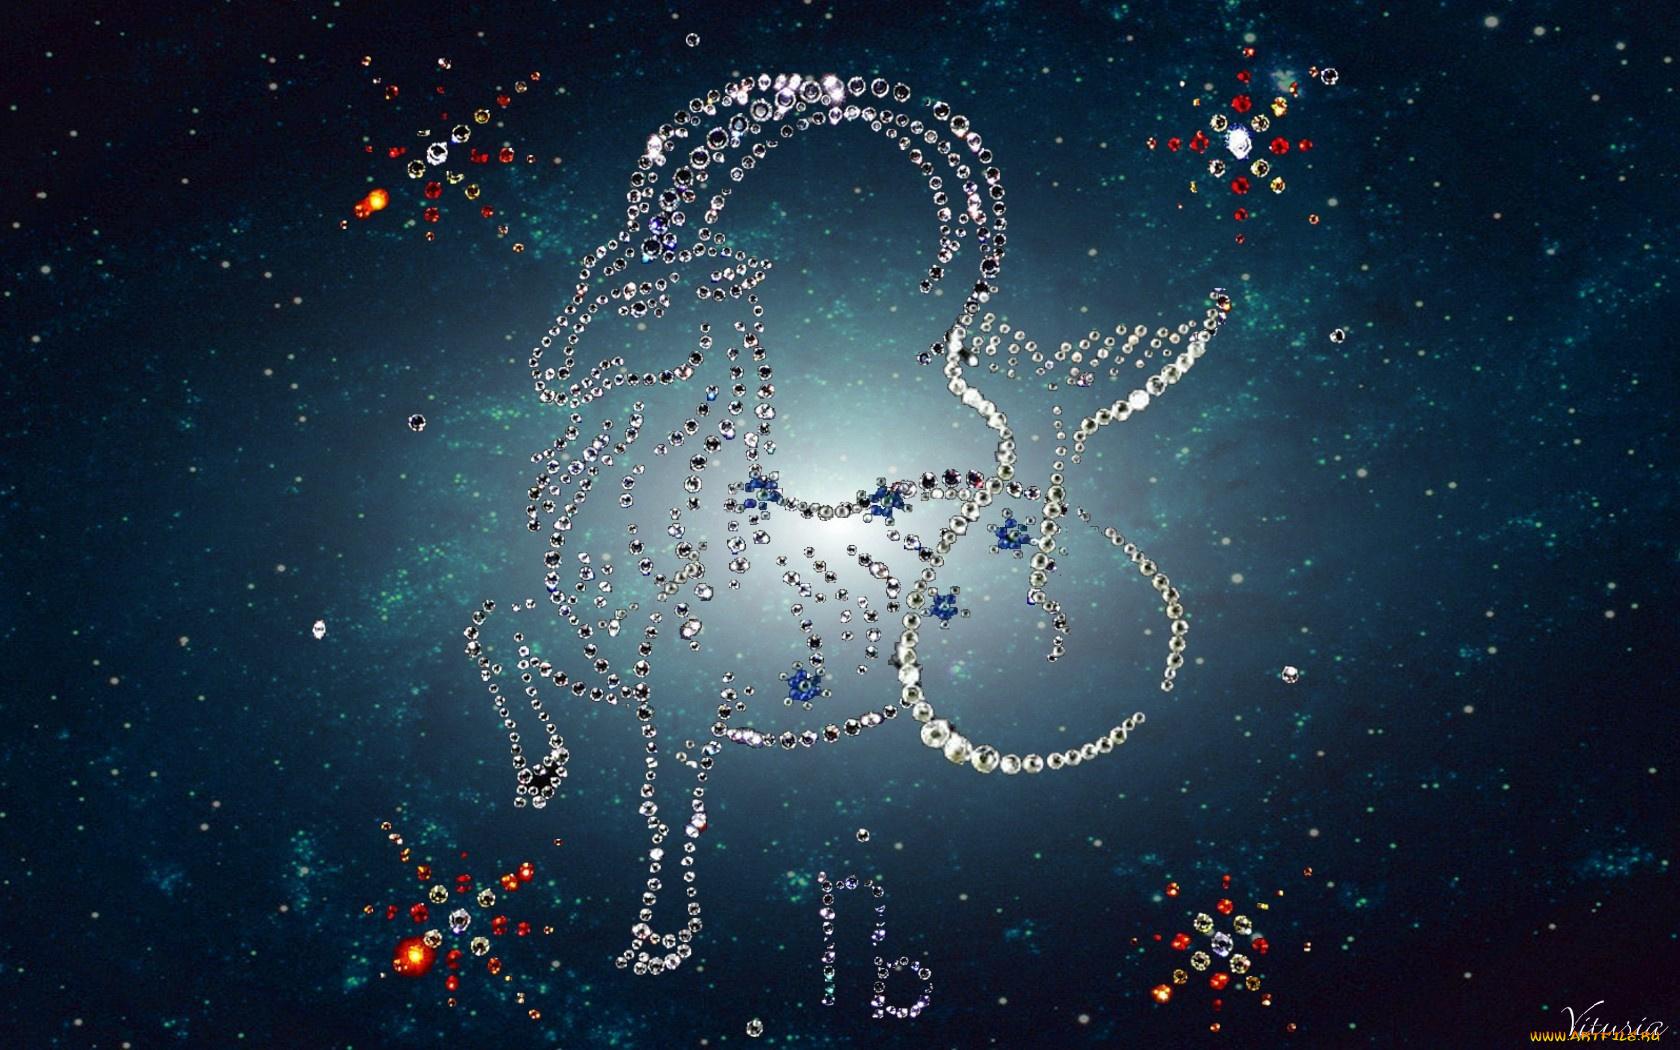 Любви картинки, козерог картинки знак зодиака красивые